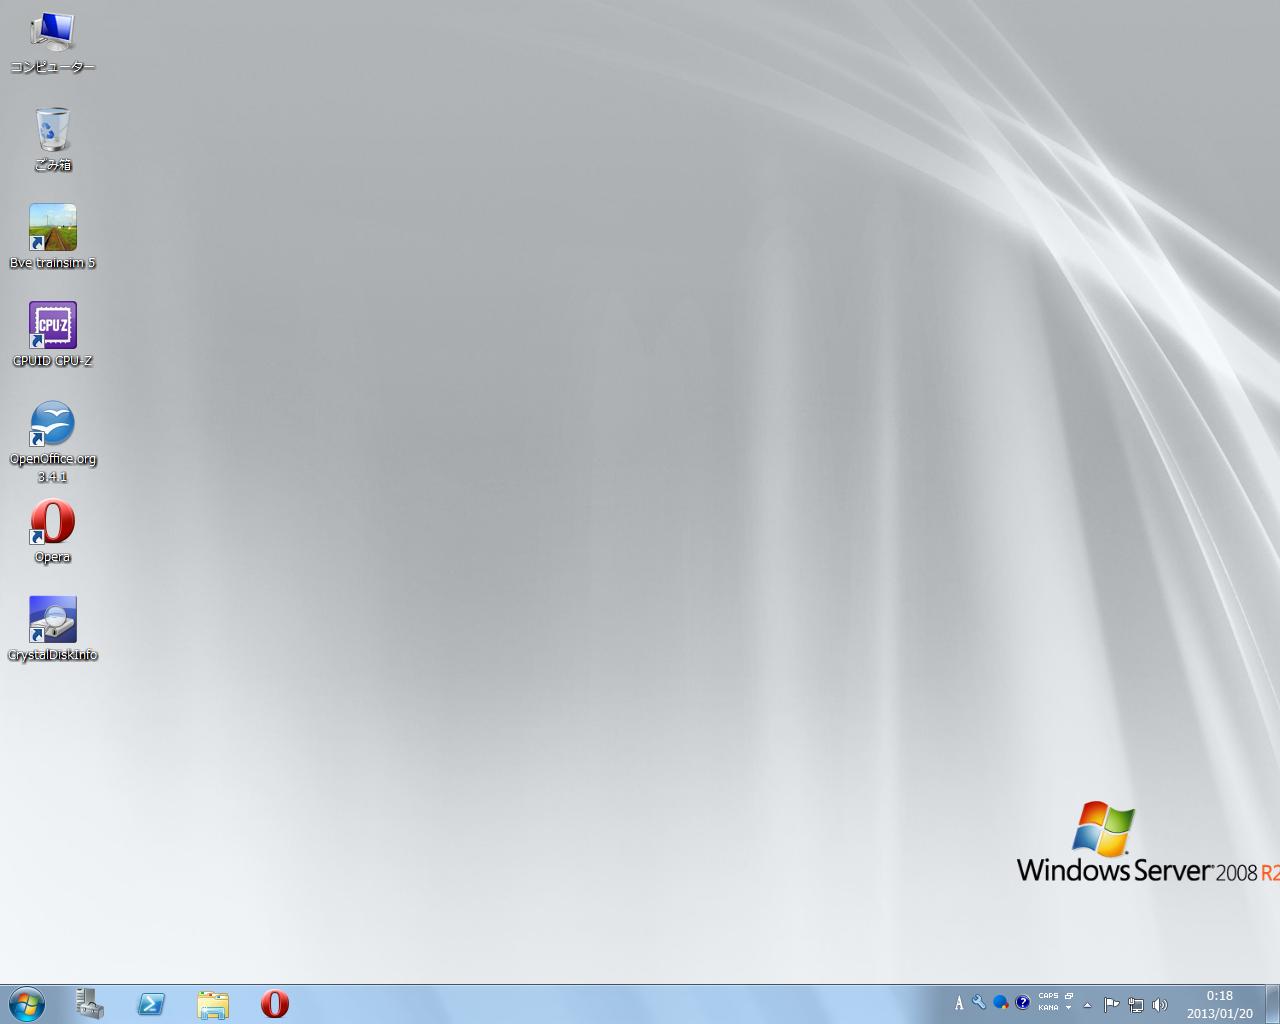 WindowsServer2008R2デスクトップ